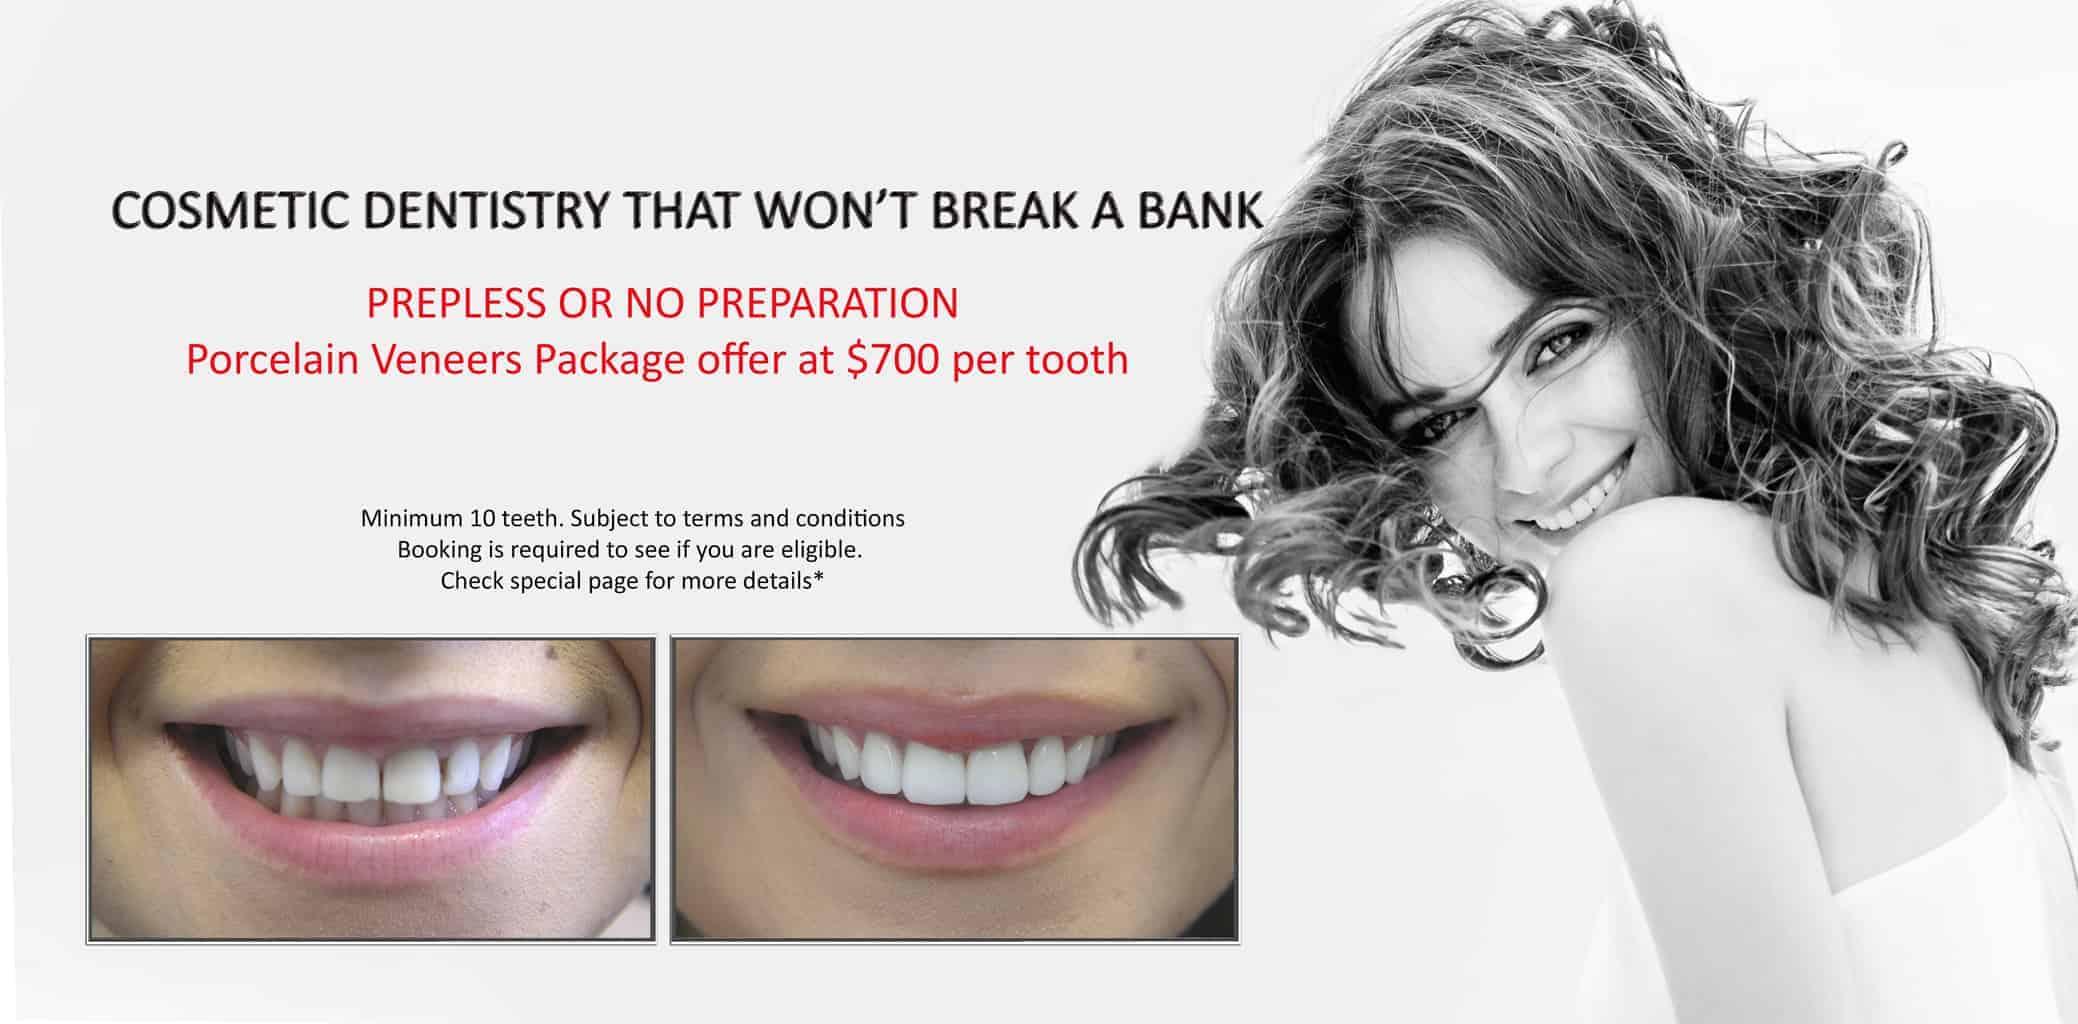 Affordable Tooth Decay Treatment | Best & Gentle Dental Fillings Melbourne CBD | BEST DENTIST MELBOURNE CBD